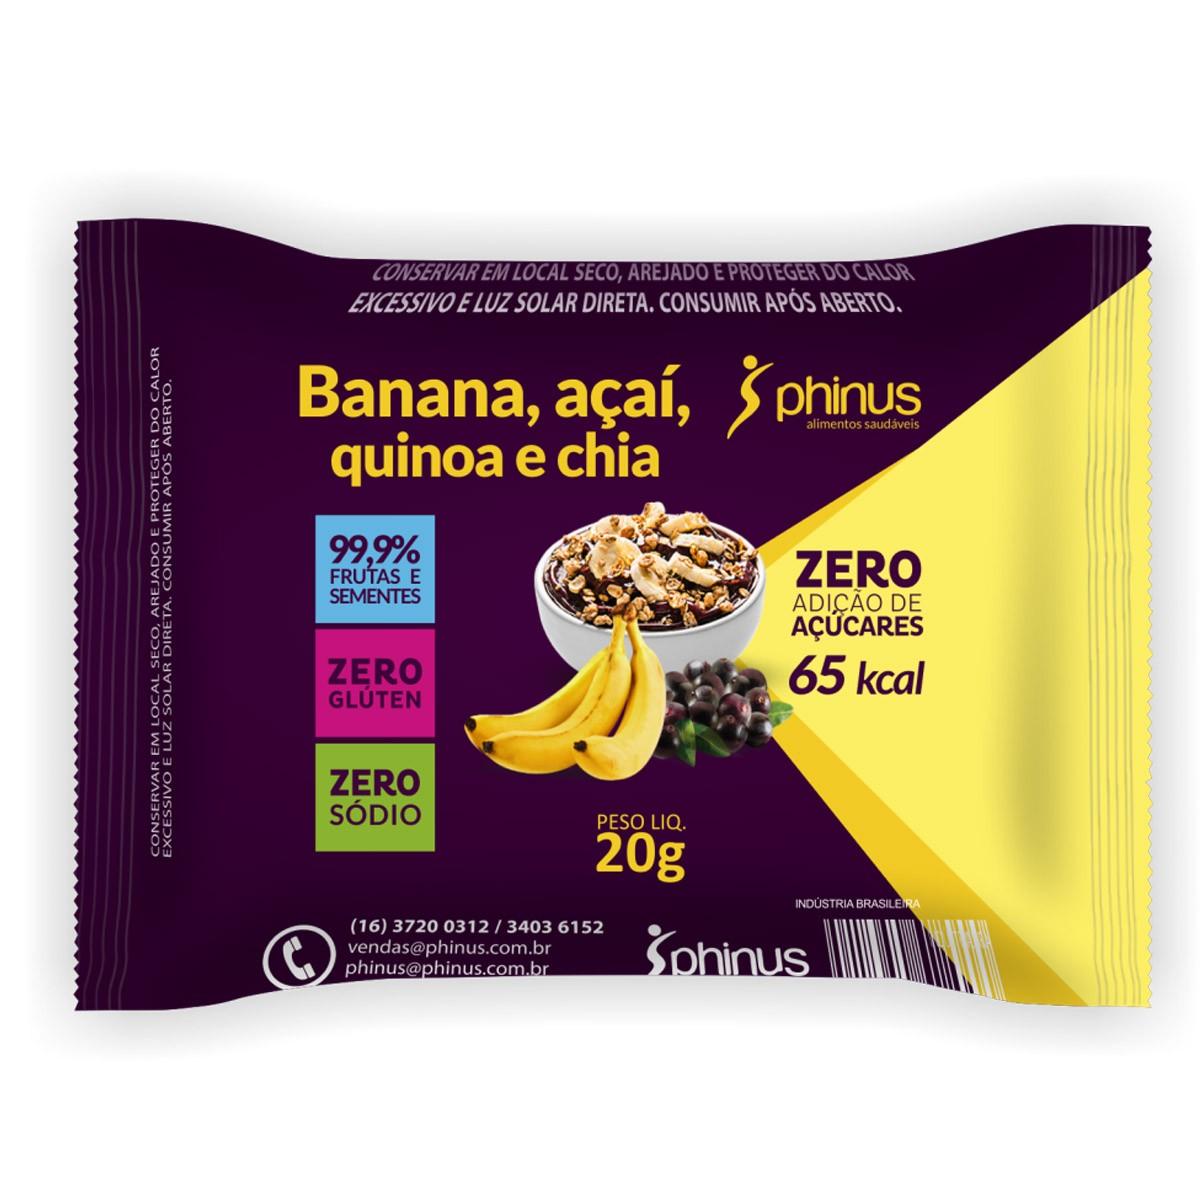 Tablete de Banana, Açaí Zero 20g - Phinus